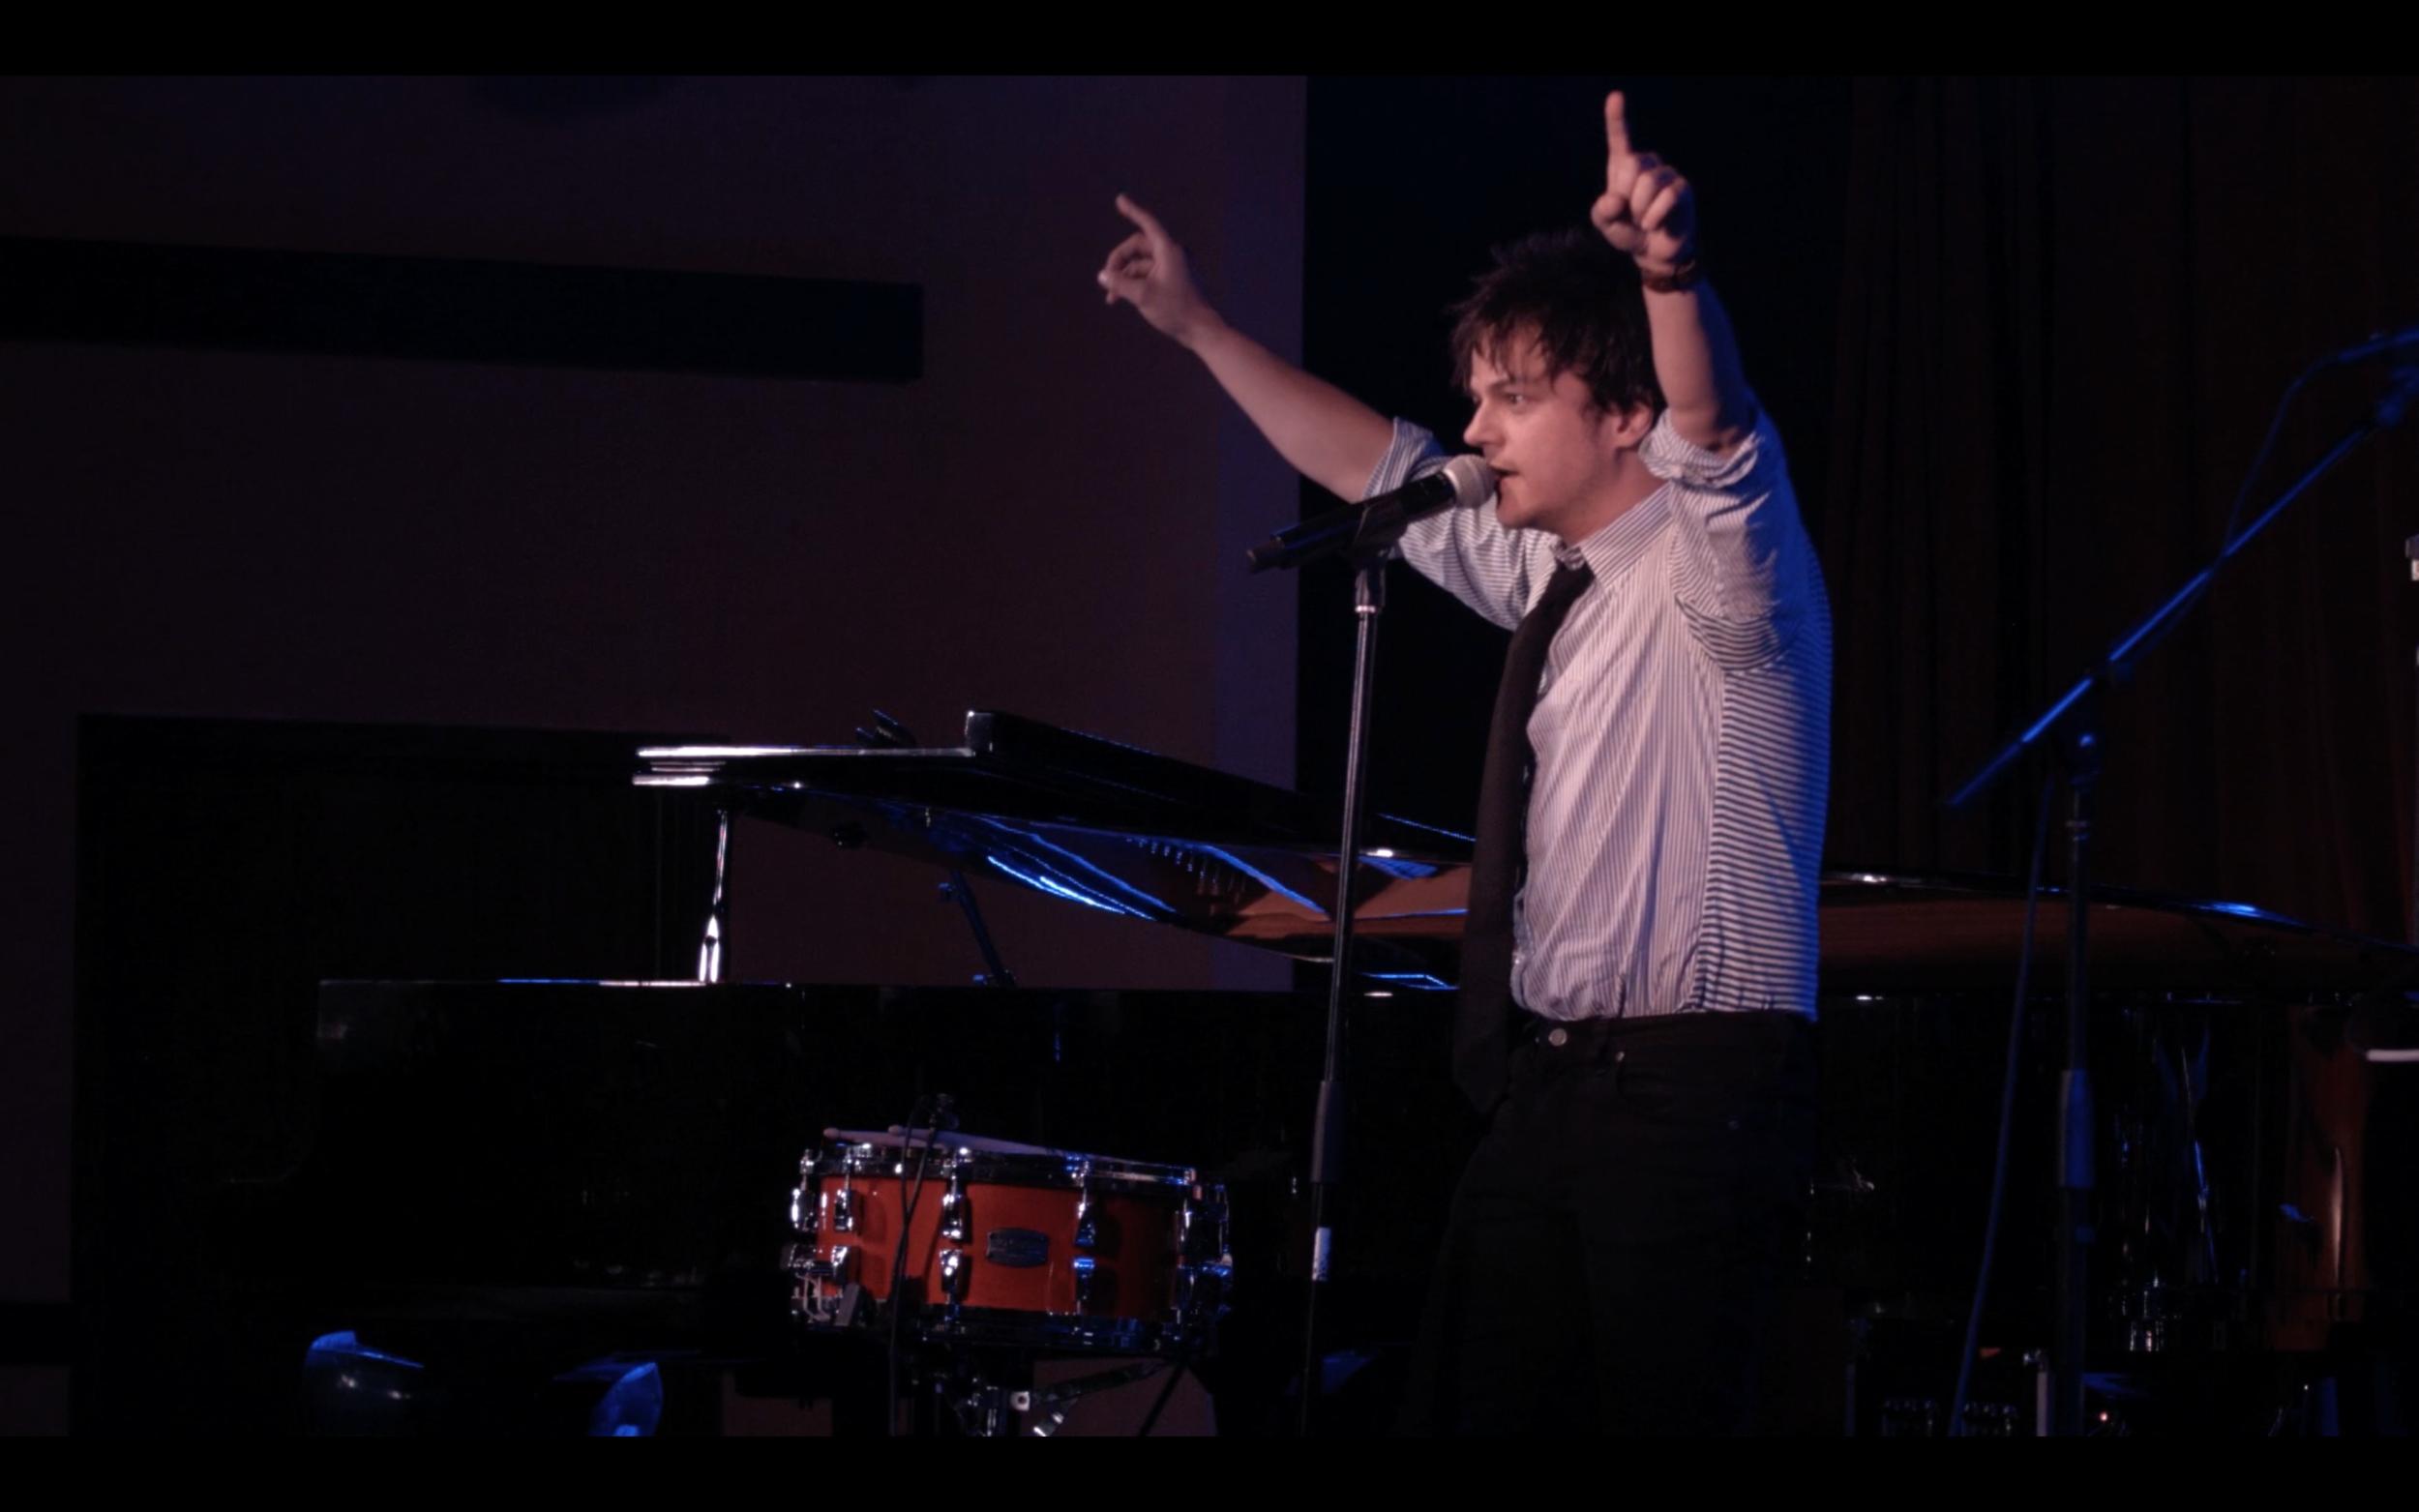 FIlming with Jamie Cullum - Award winning Jazz Musician ( Jamie Cullum - Shake It Off  )